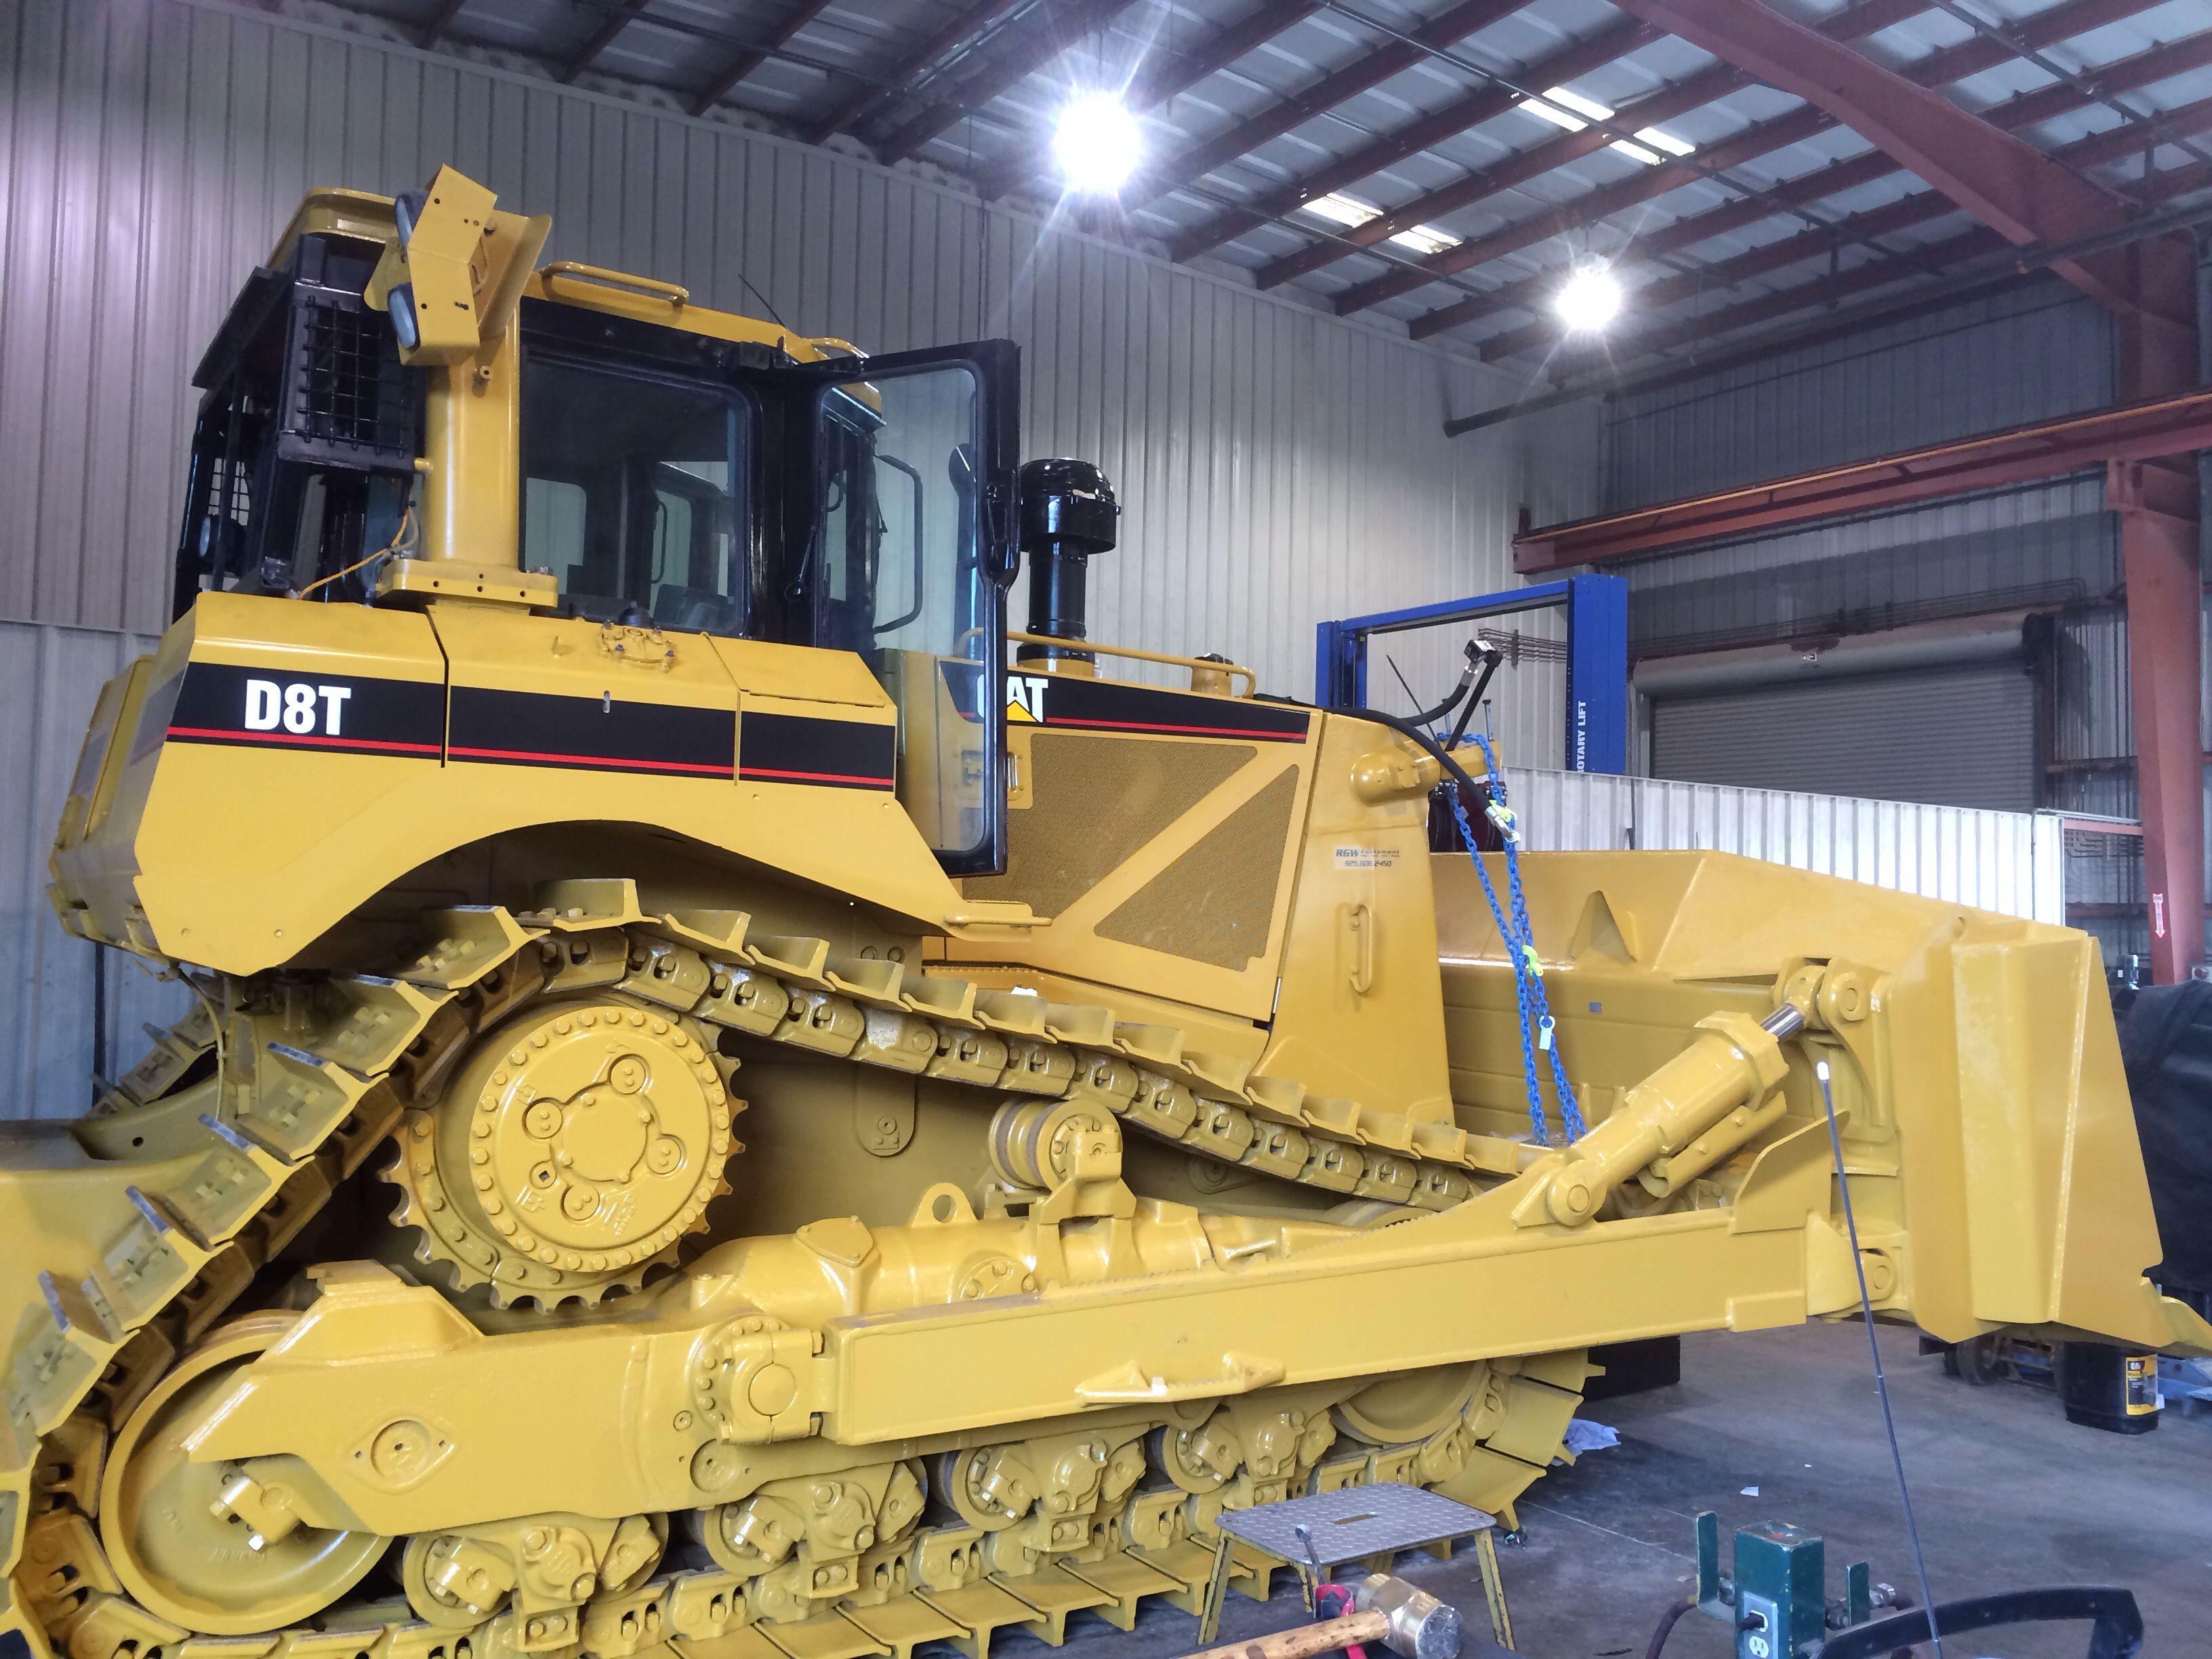 D8t rebuilt at the shop Construction equipment, Heavy